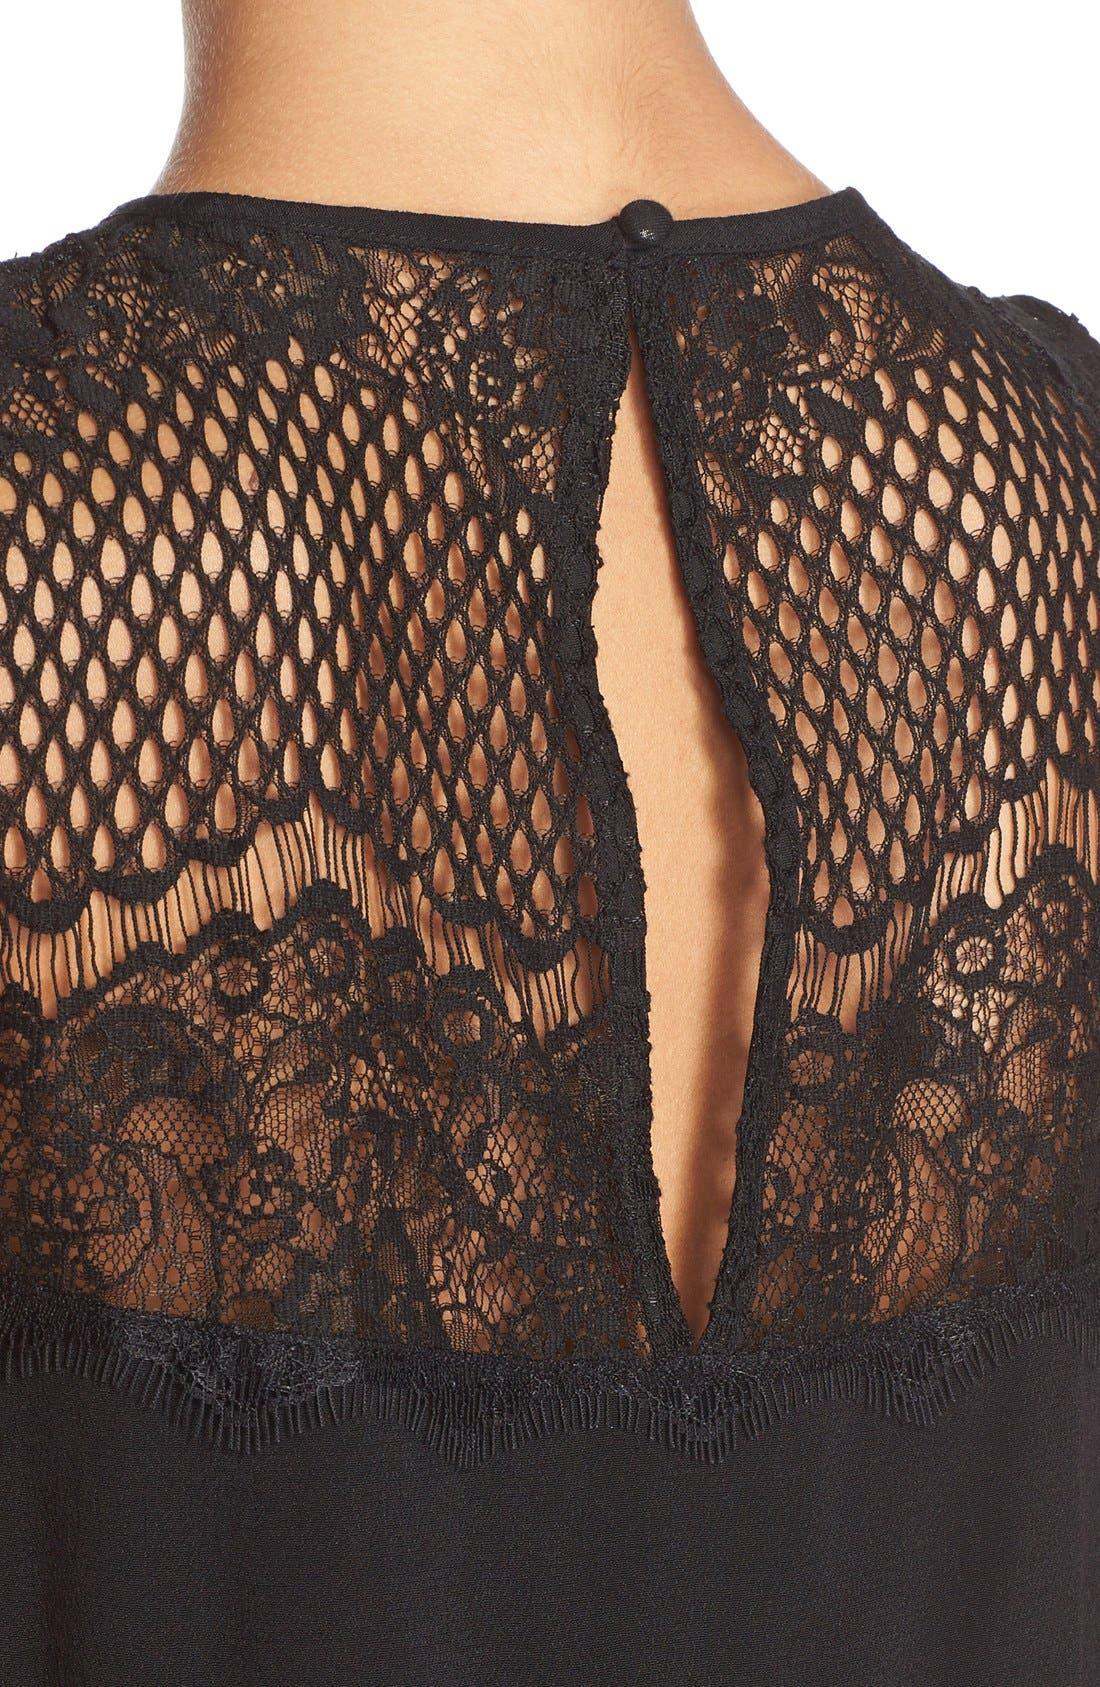 Adeyln Rae Lace Back Crepe Romper,                             Alternate thumbnail 3, color,                             001